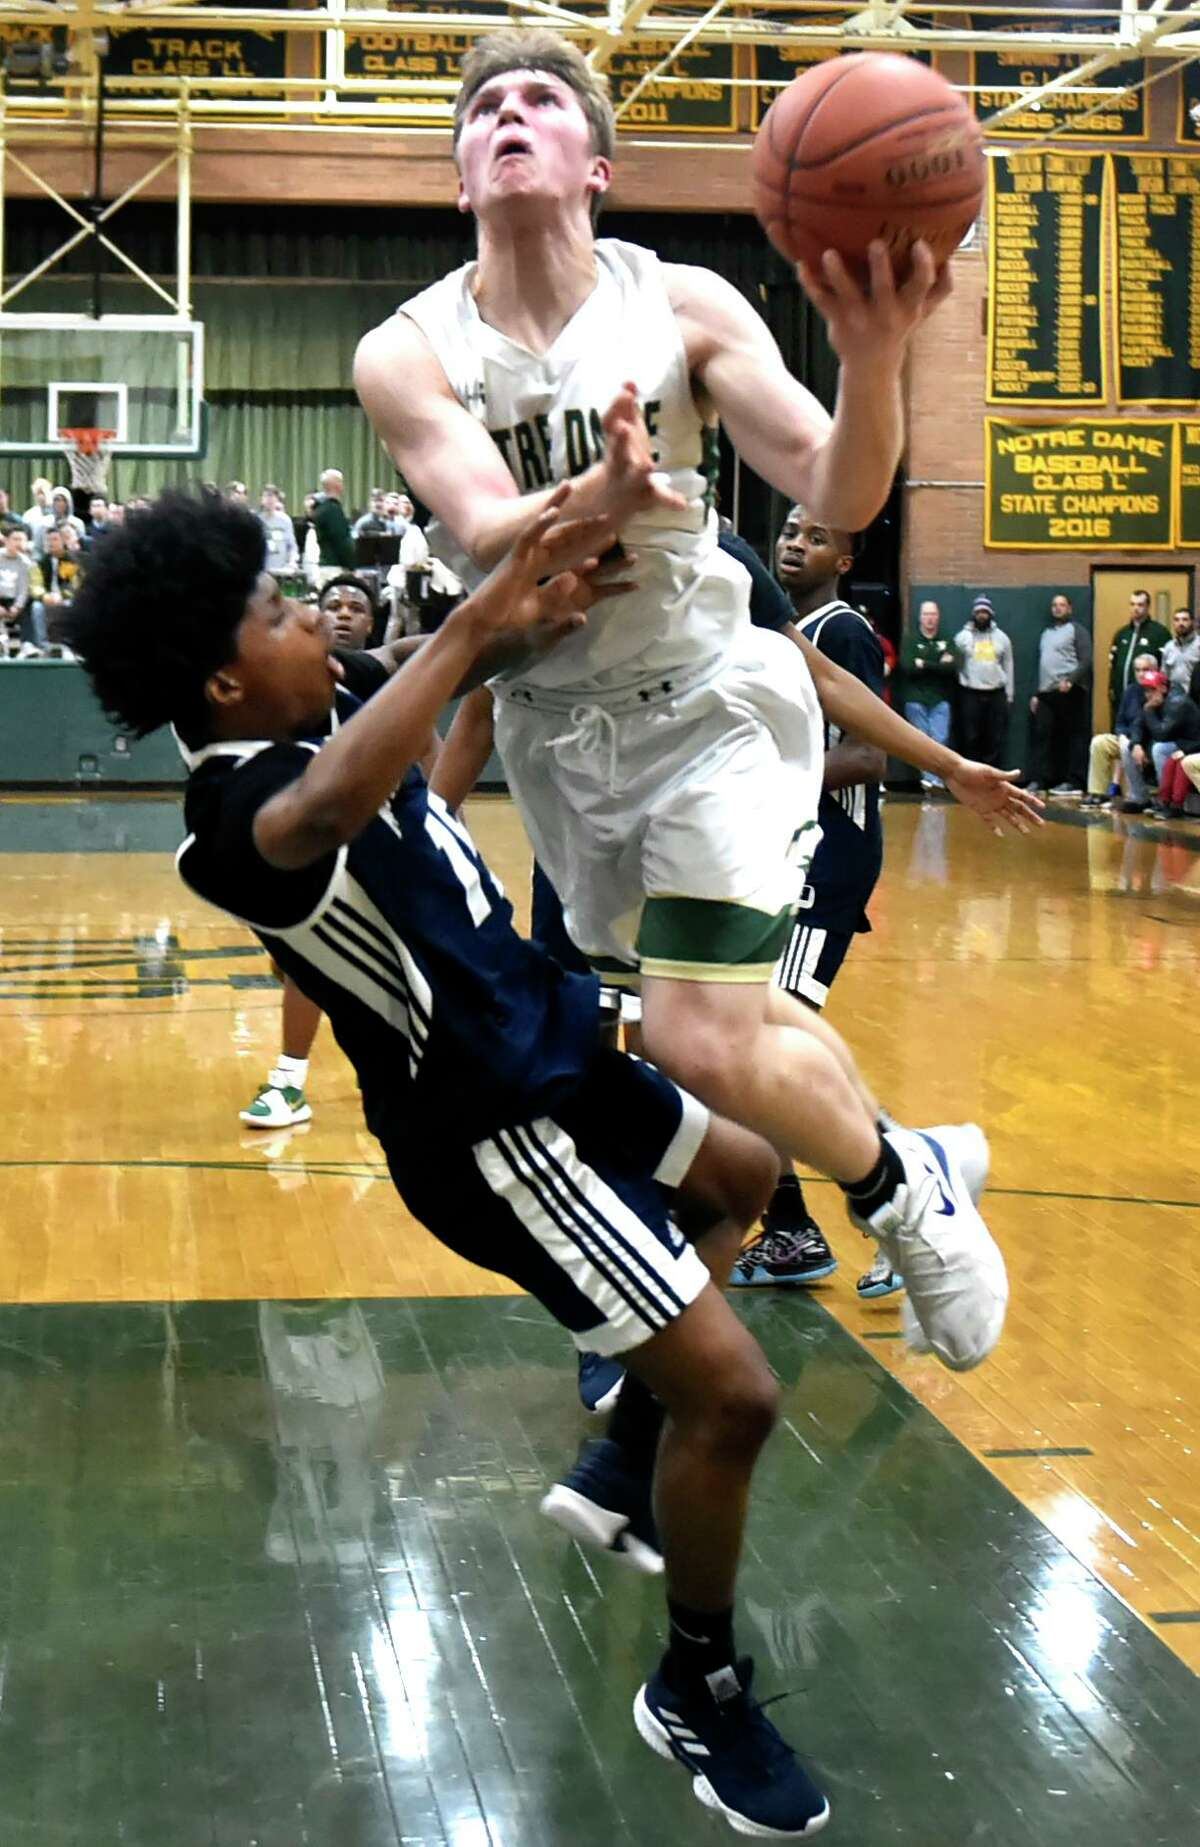 Hillhouse's Khalel Francis, left, and Notre Dame-West Haven's Zach Laput collide underneath the basket during a game earlier this month.